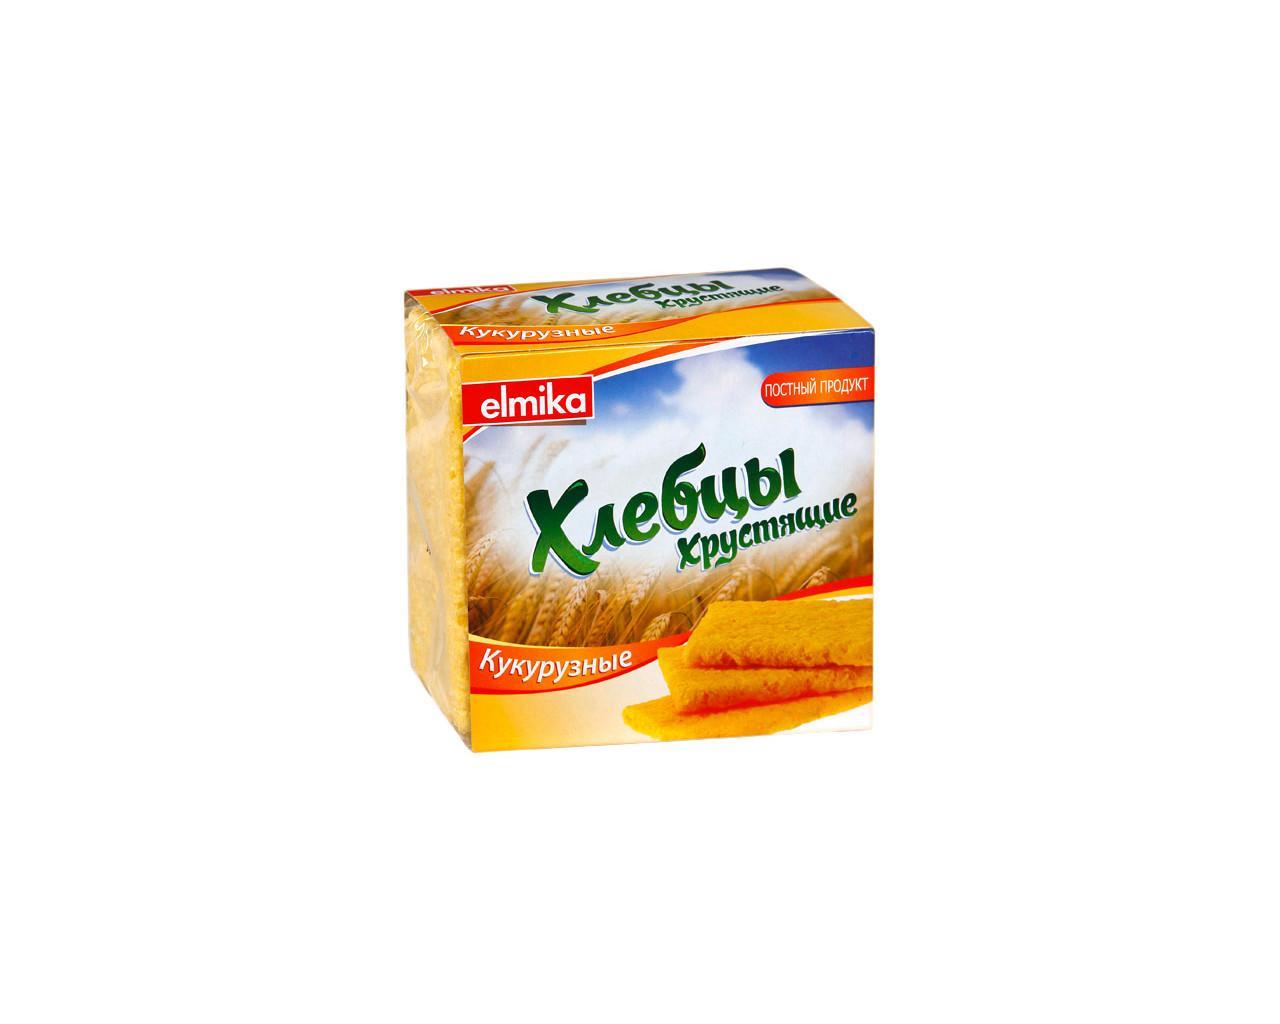 Хлебцы Elmika хрустящие кукурузные